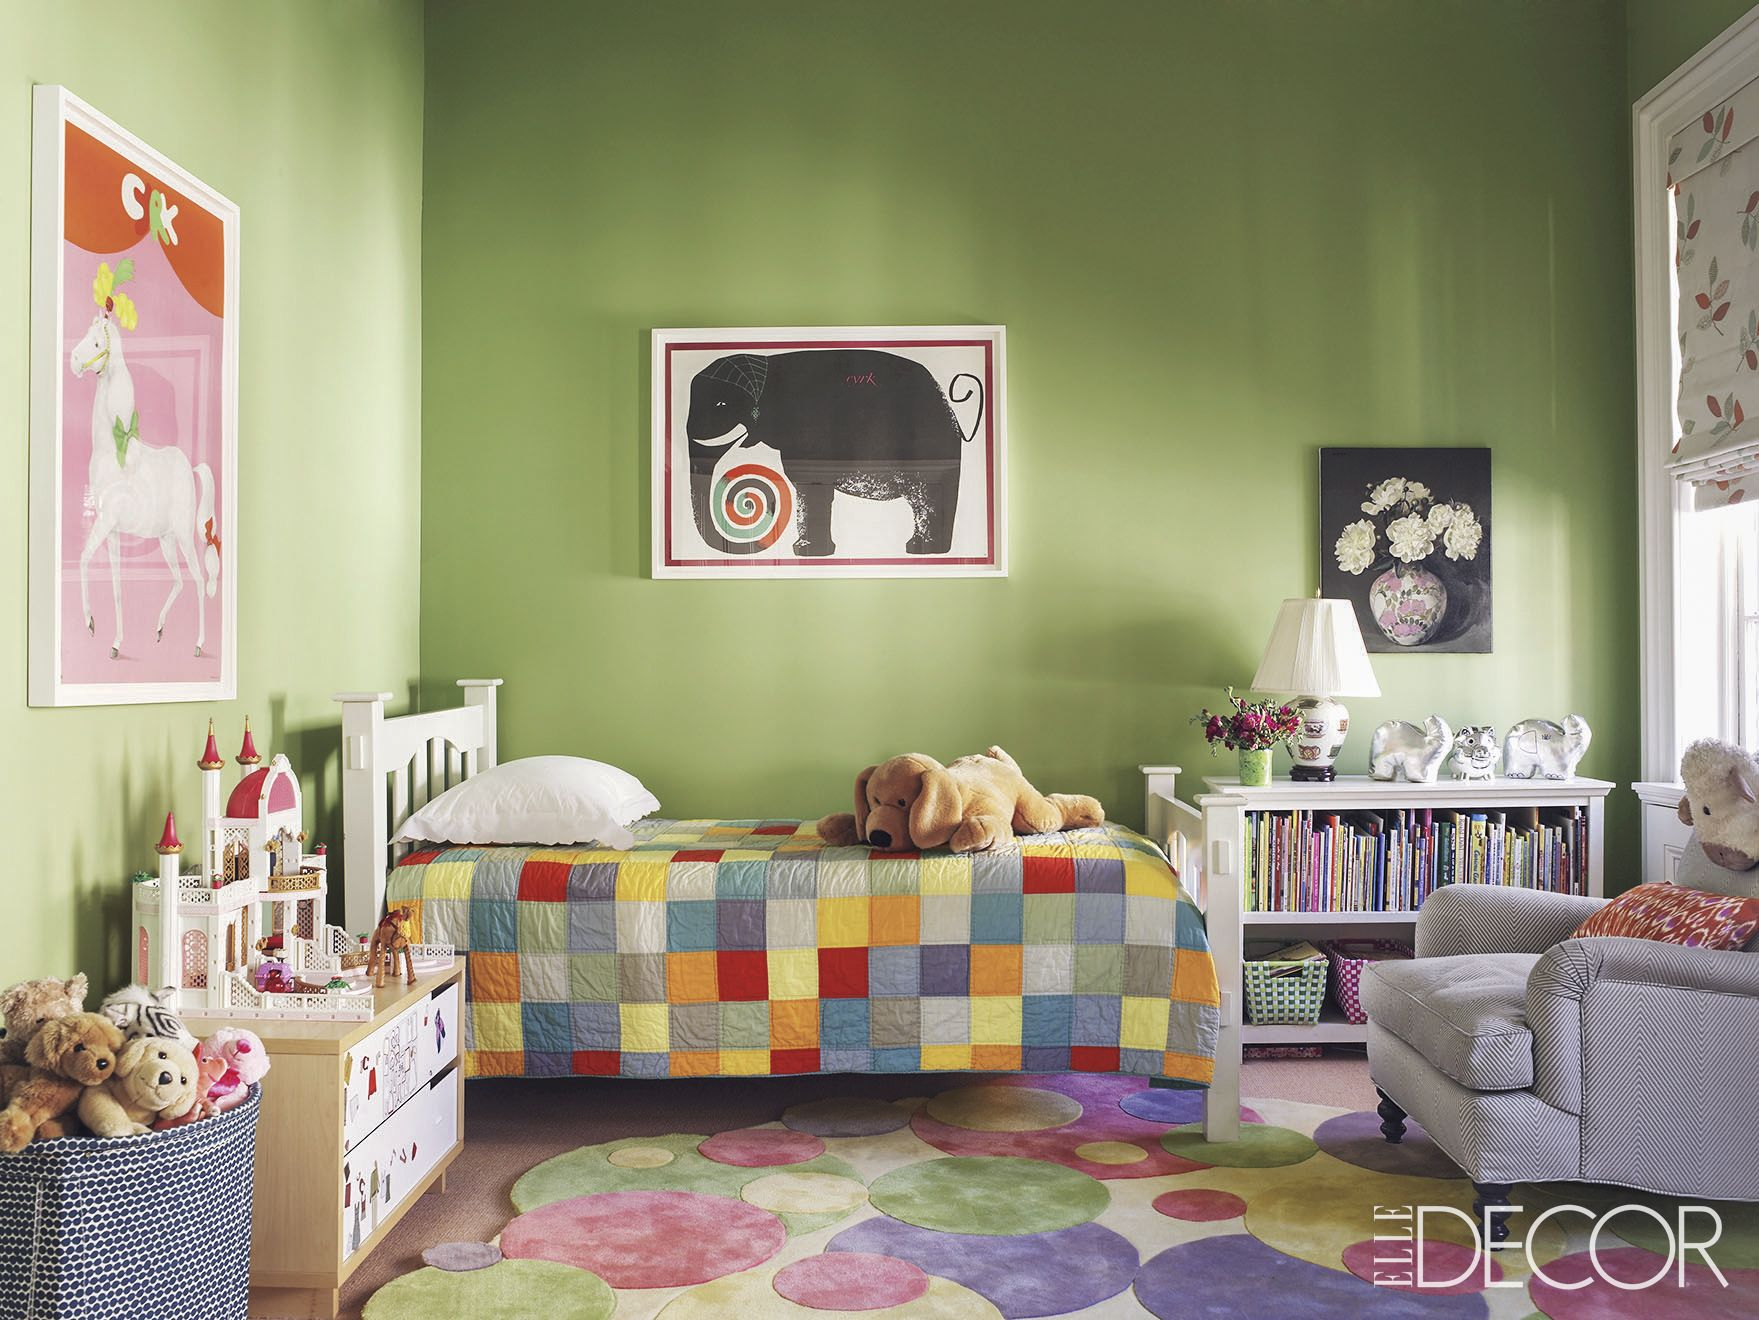 18 cool kids room decorating ideas kids room decor - Kids Room Wall Decor Ideas